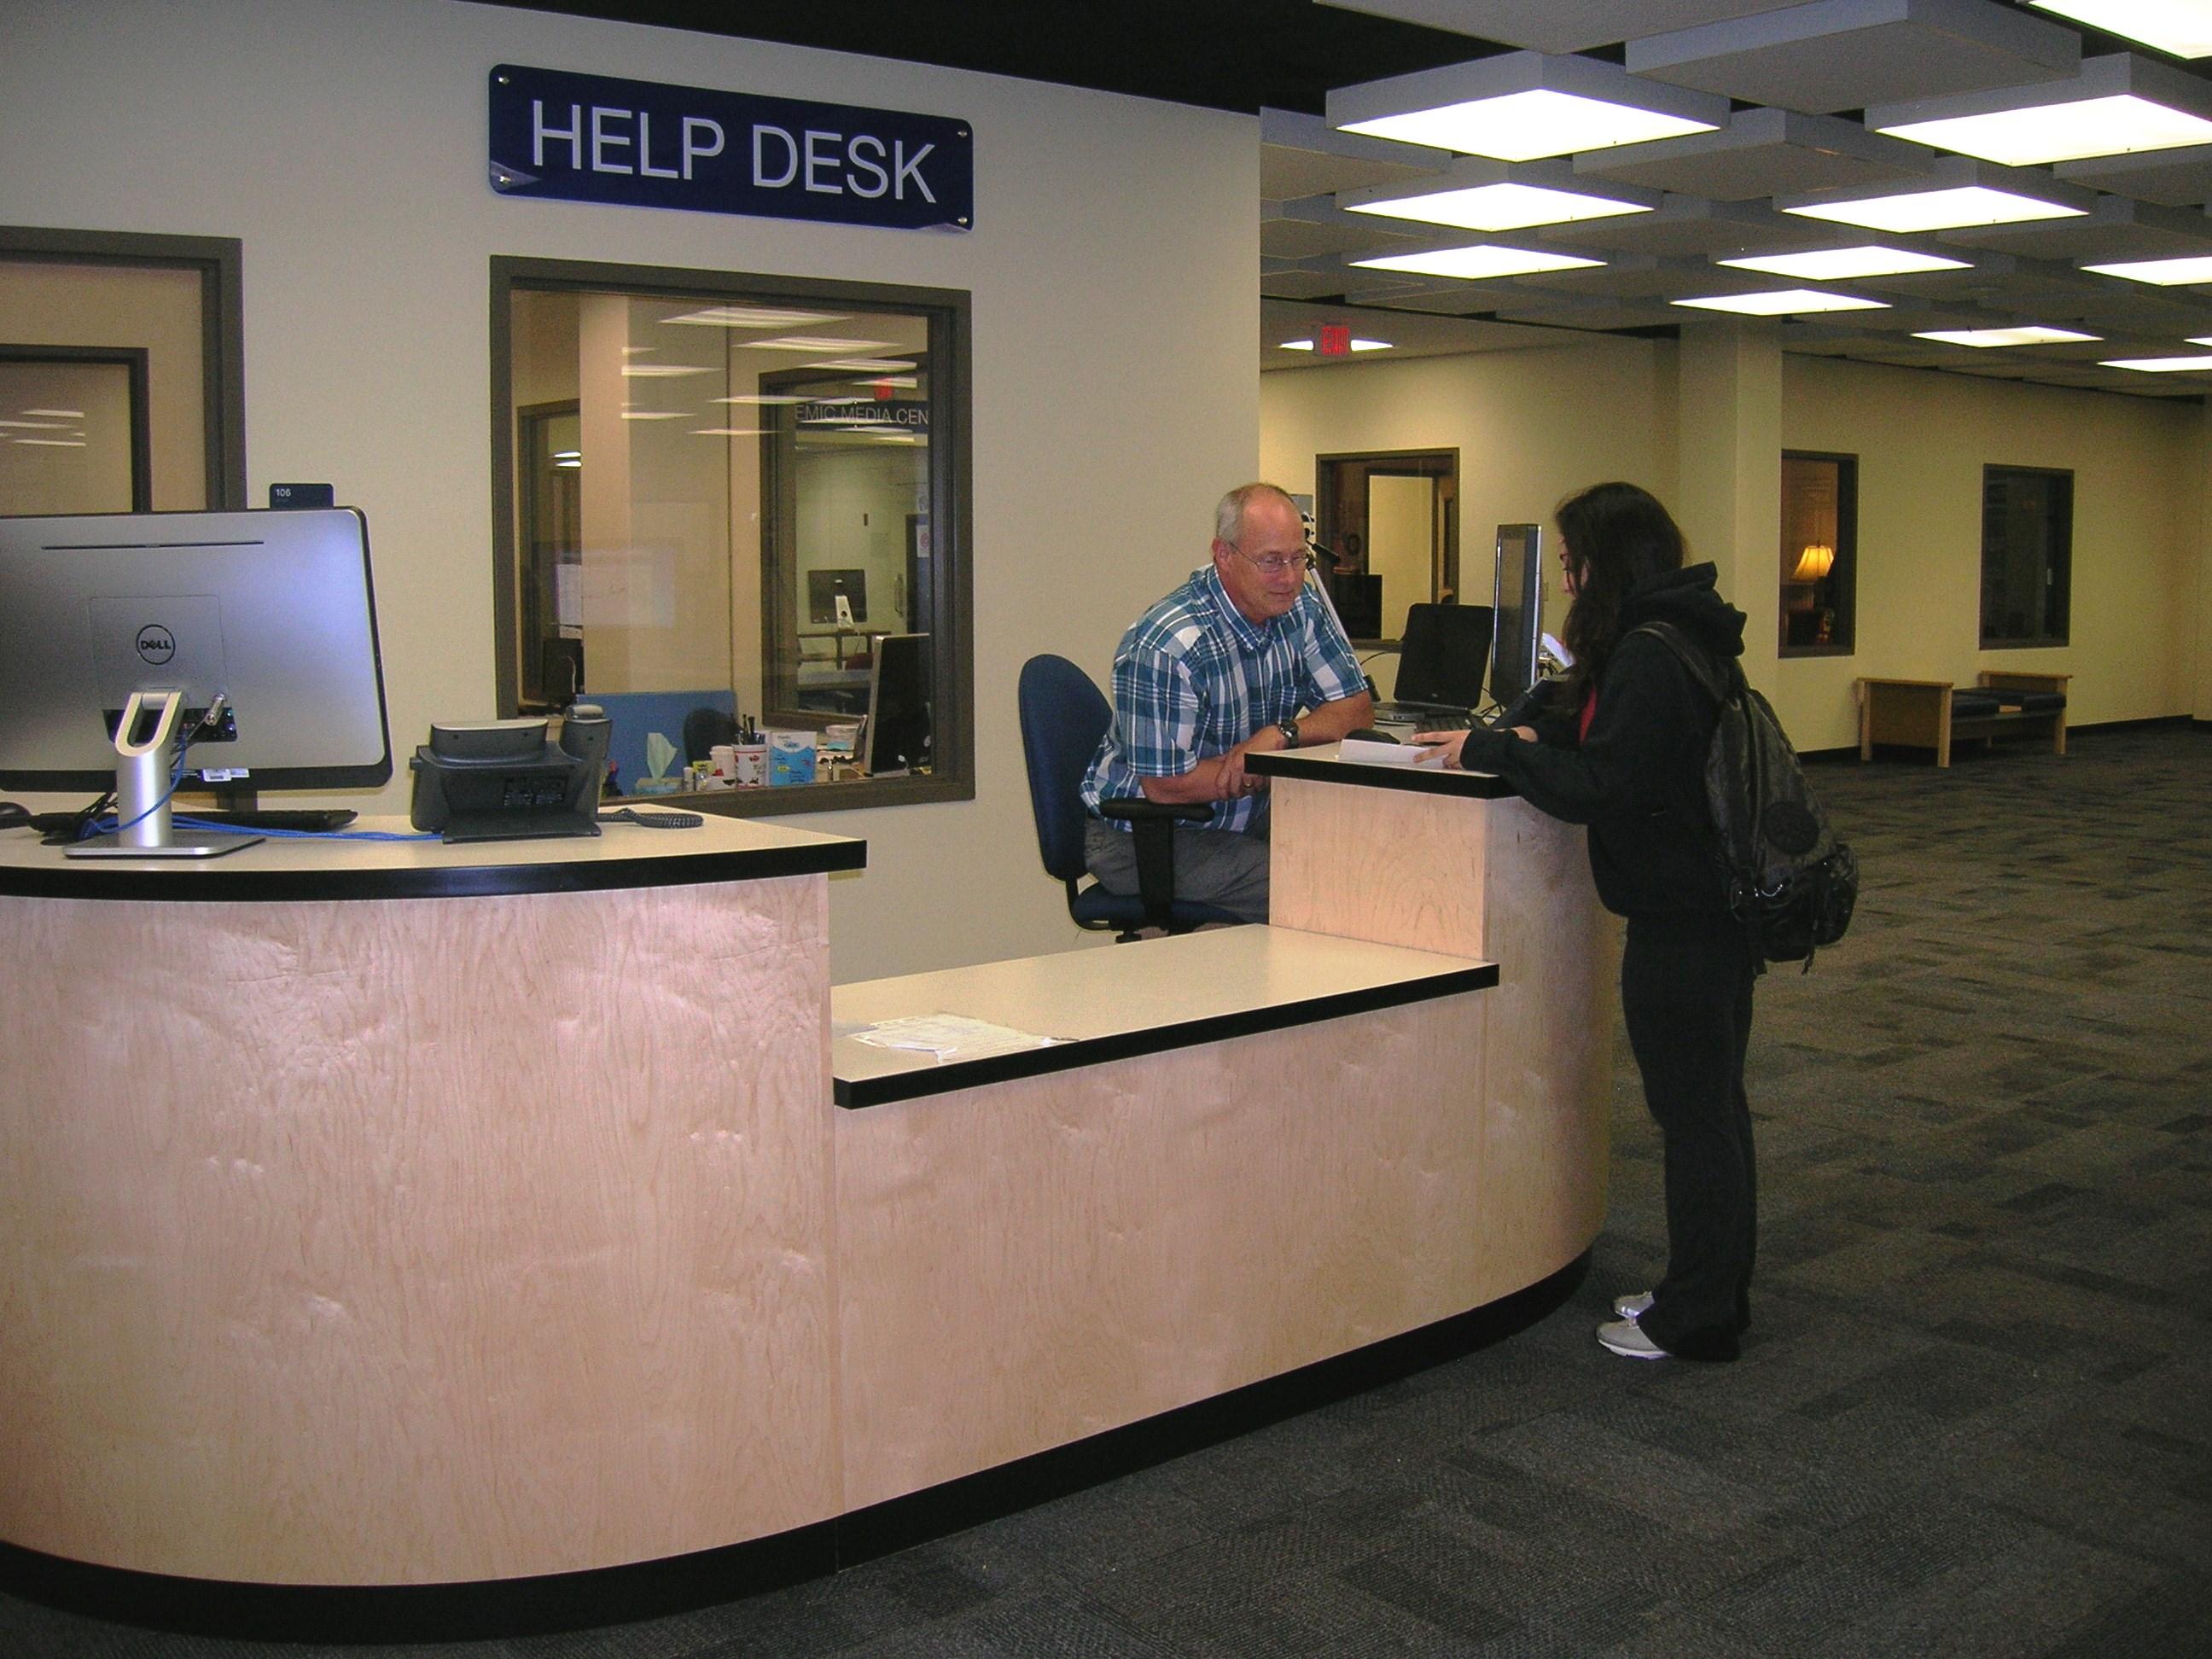 Call Help Desk